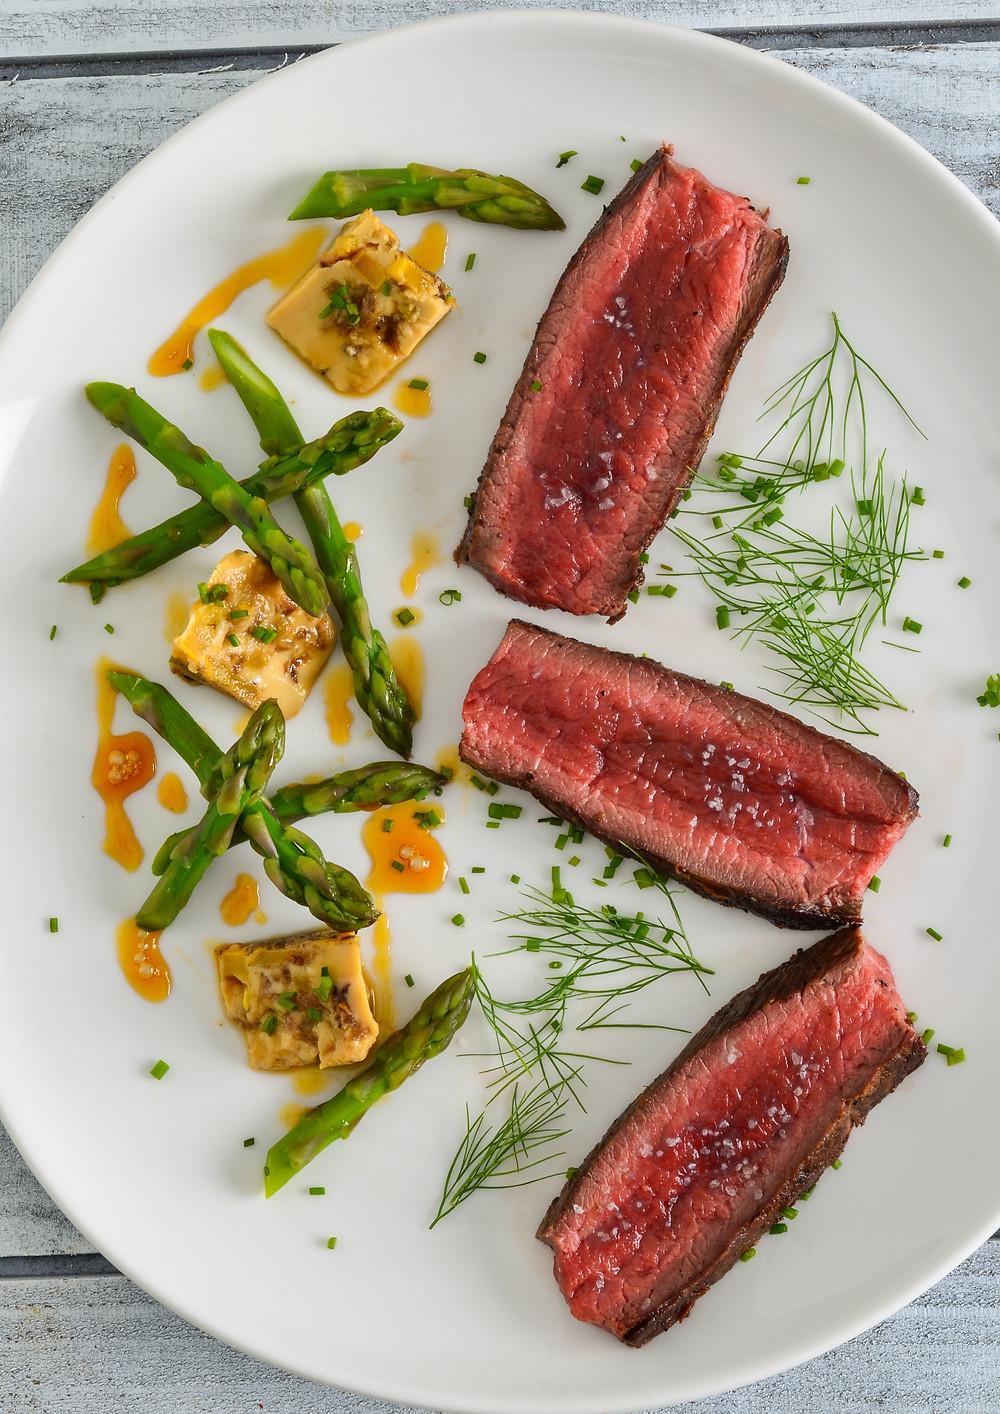 Venison Steak, Venison Recipes, Wild Game Recipes